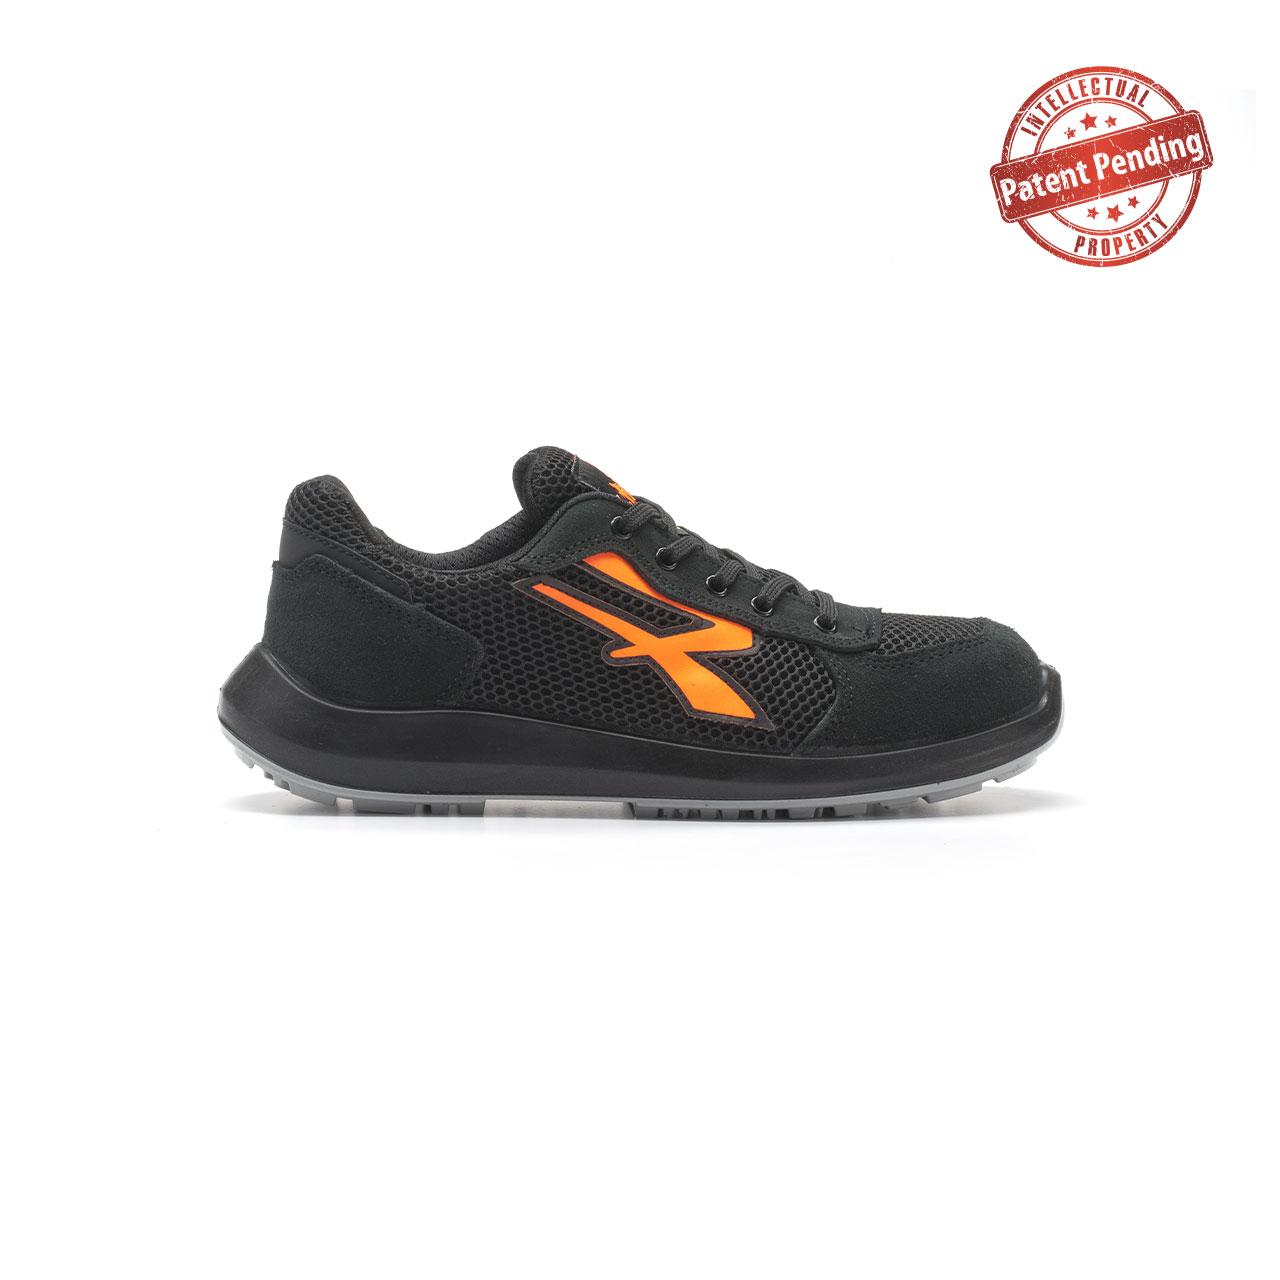 calzatura da lavoro upower modello atos linea redup vista lato destro